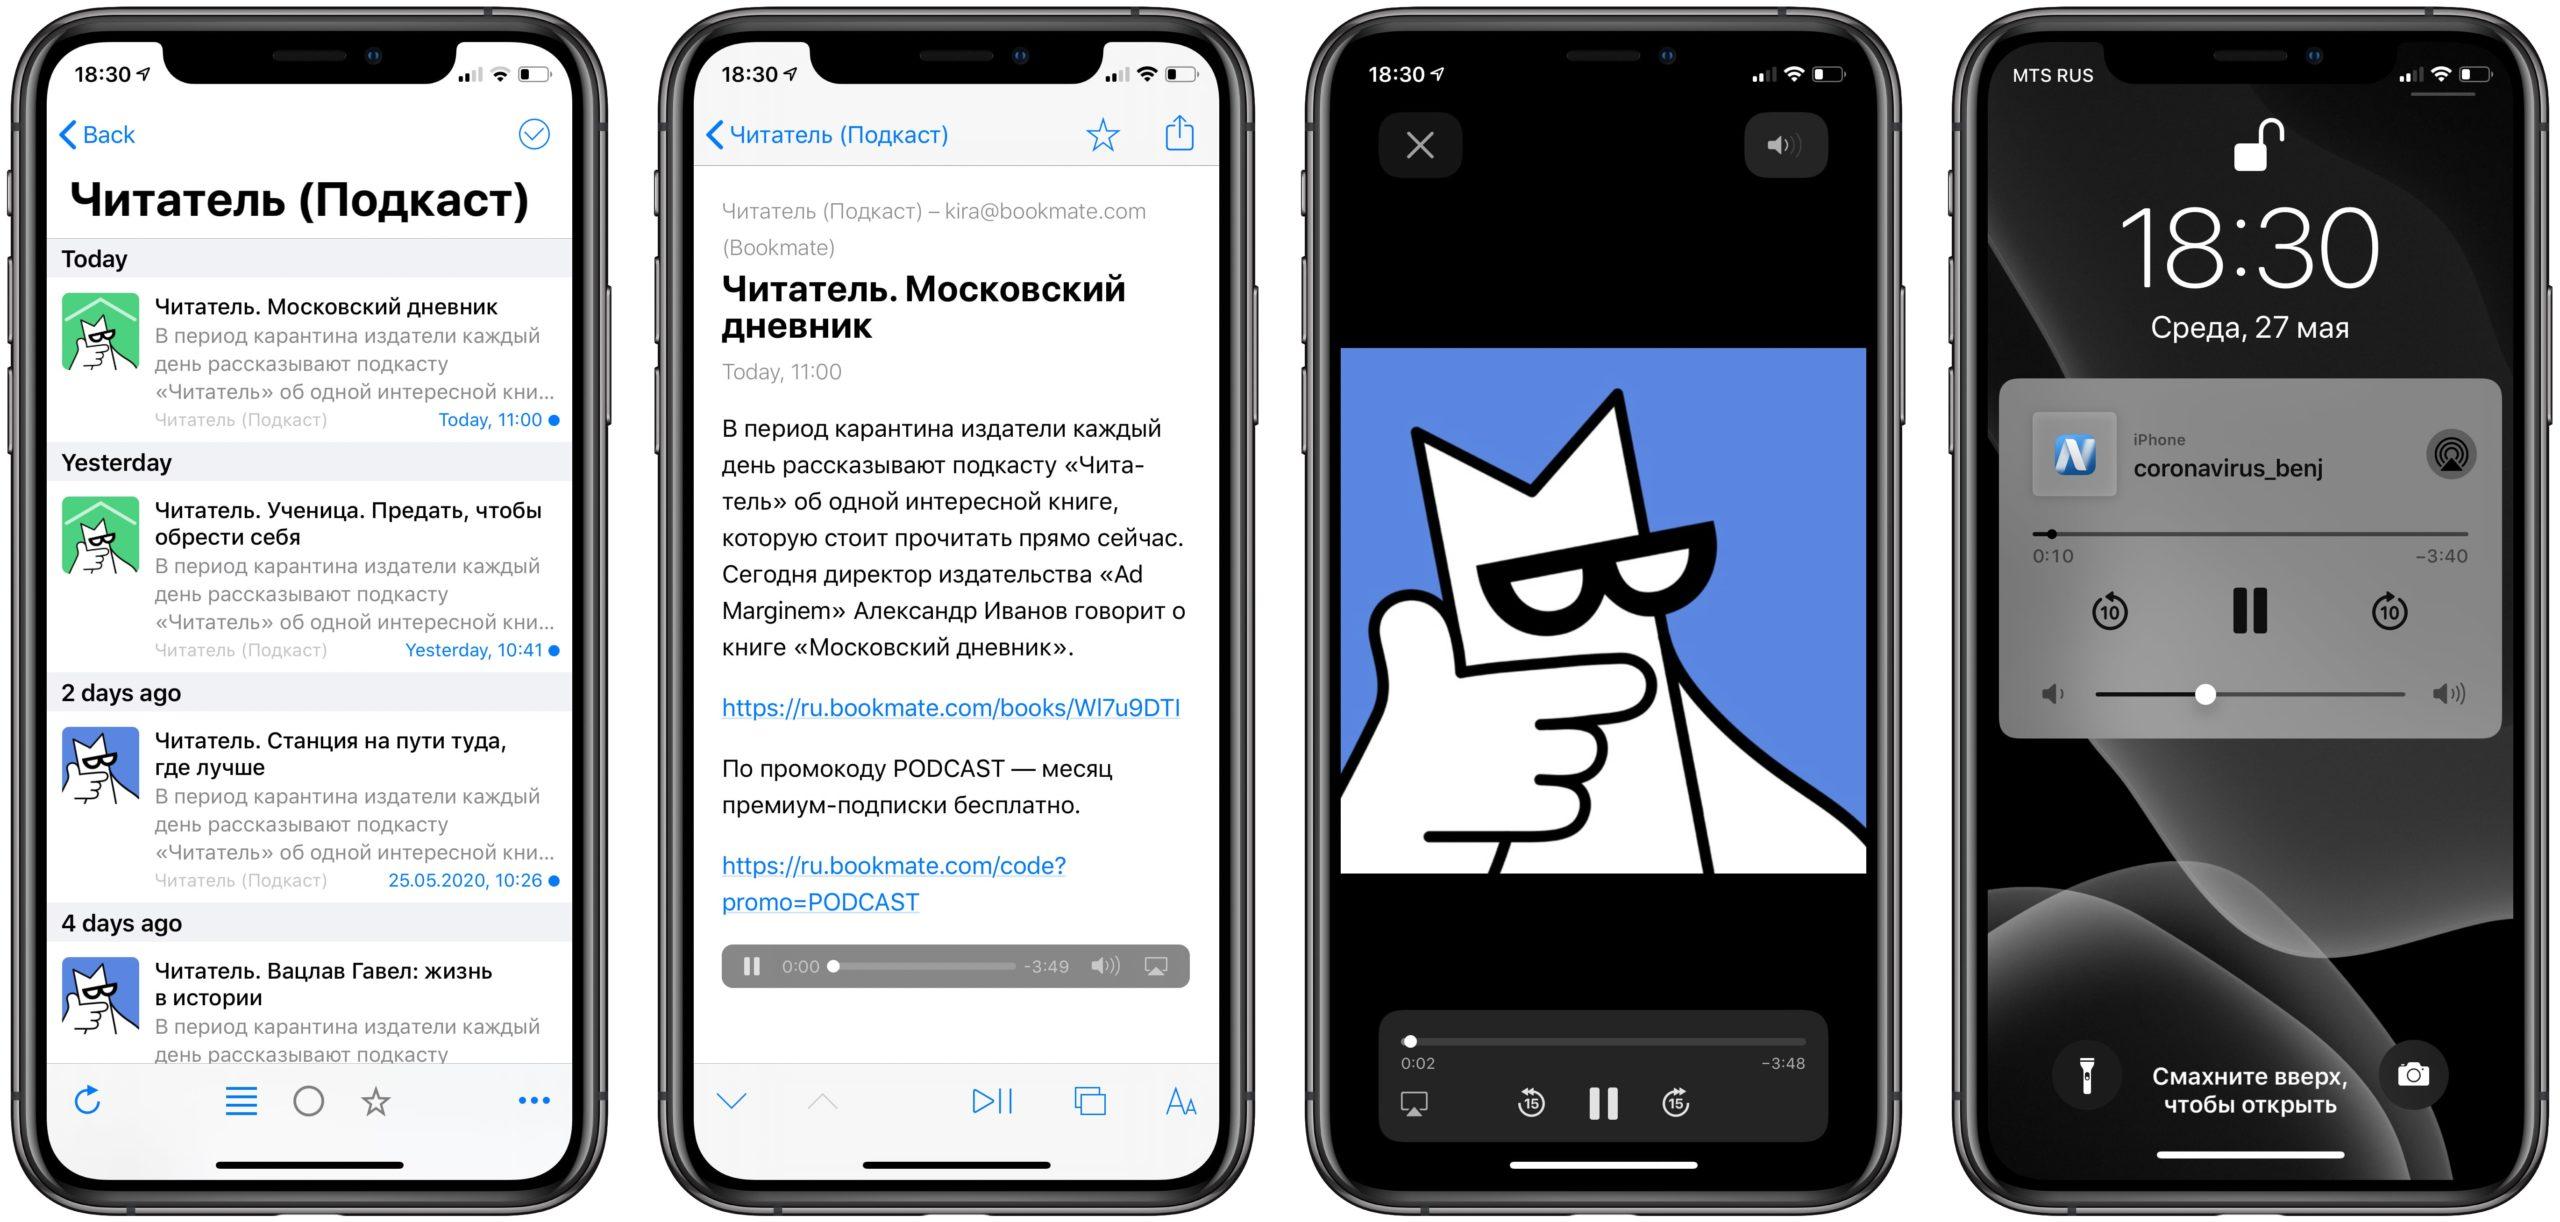 News Explorer, rss, iphone, ipad, mac